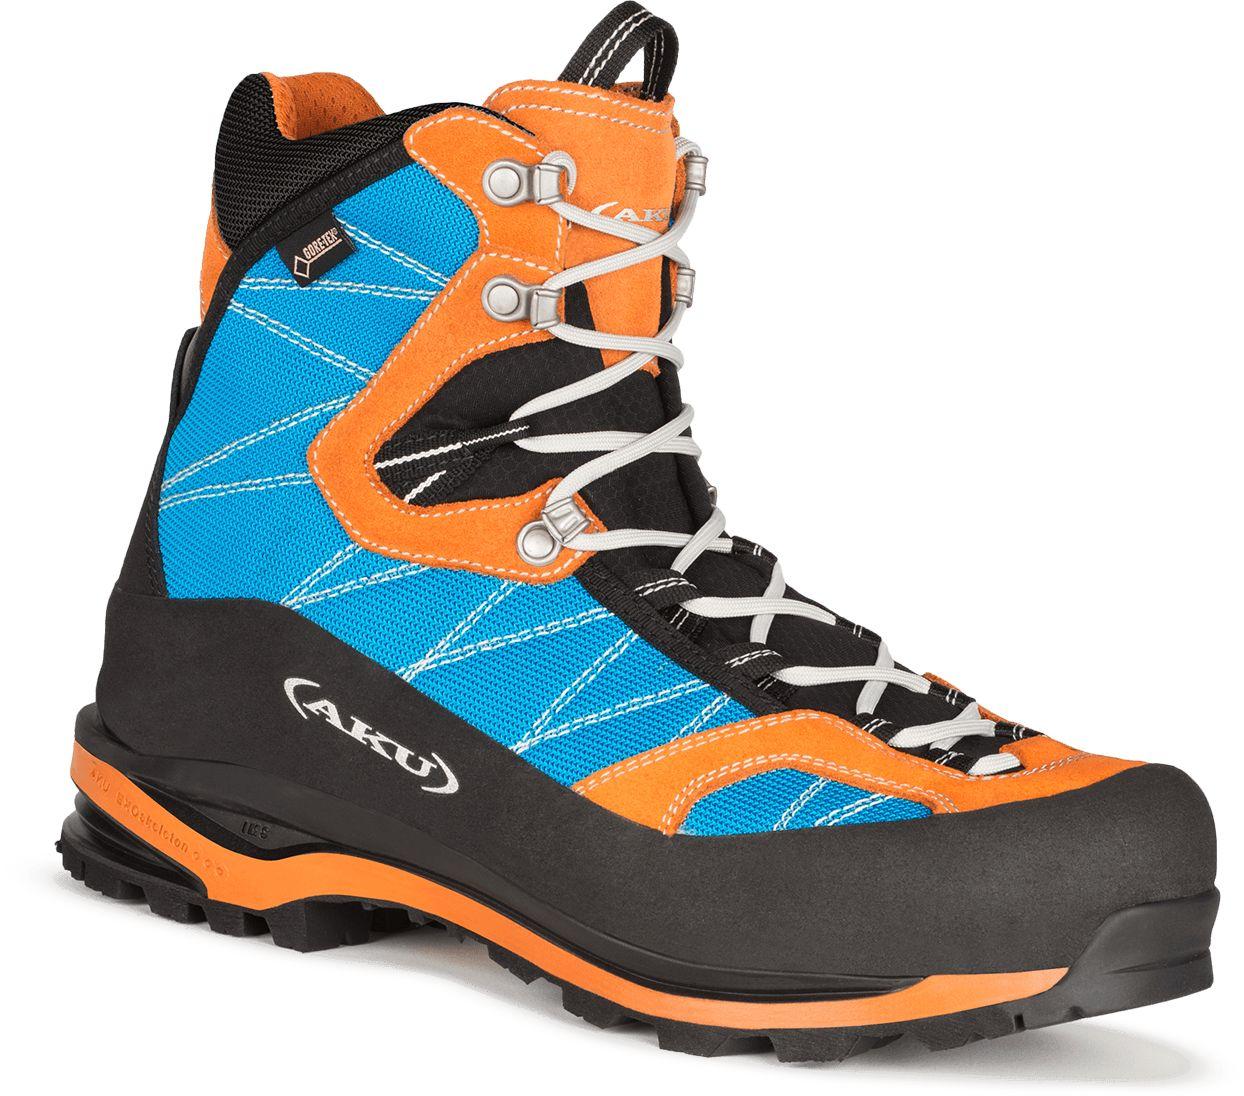 Aku Buty meskie Tengu Gtx Turquoise/ Orange r. 46 (974-454) 4051629 Tūrisma apavi